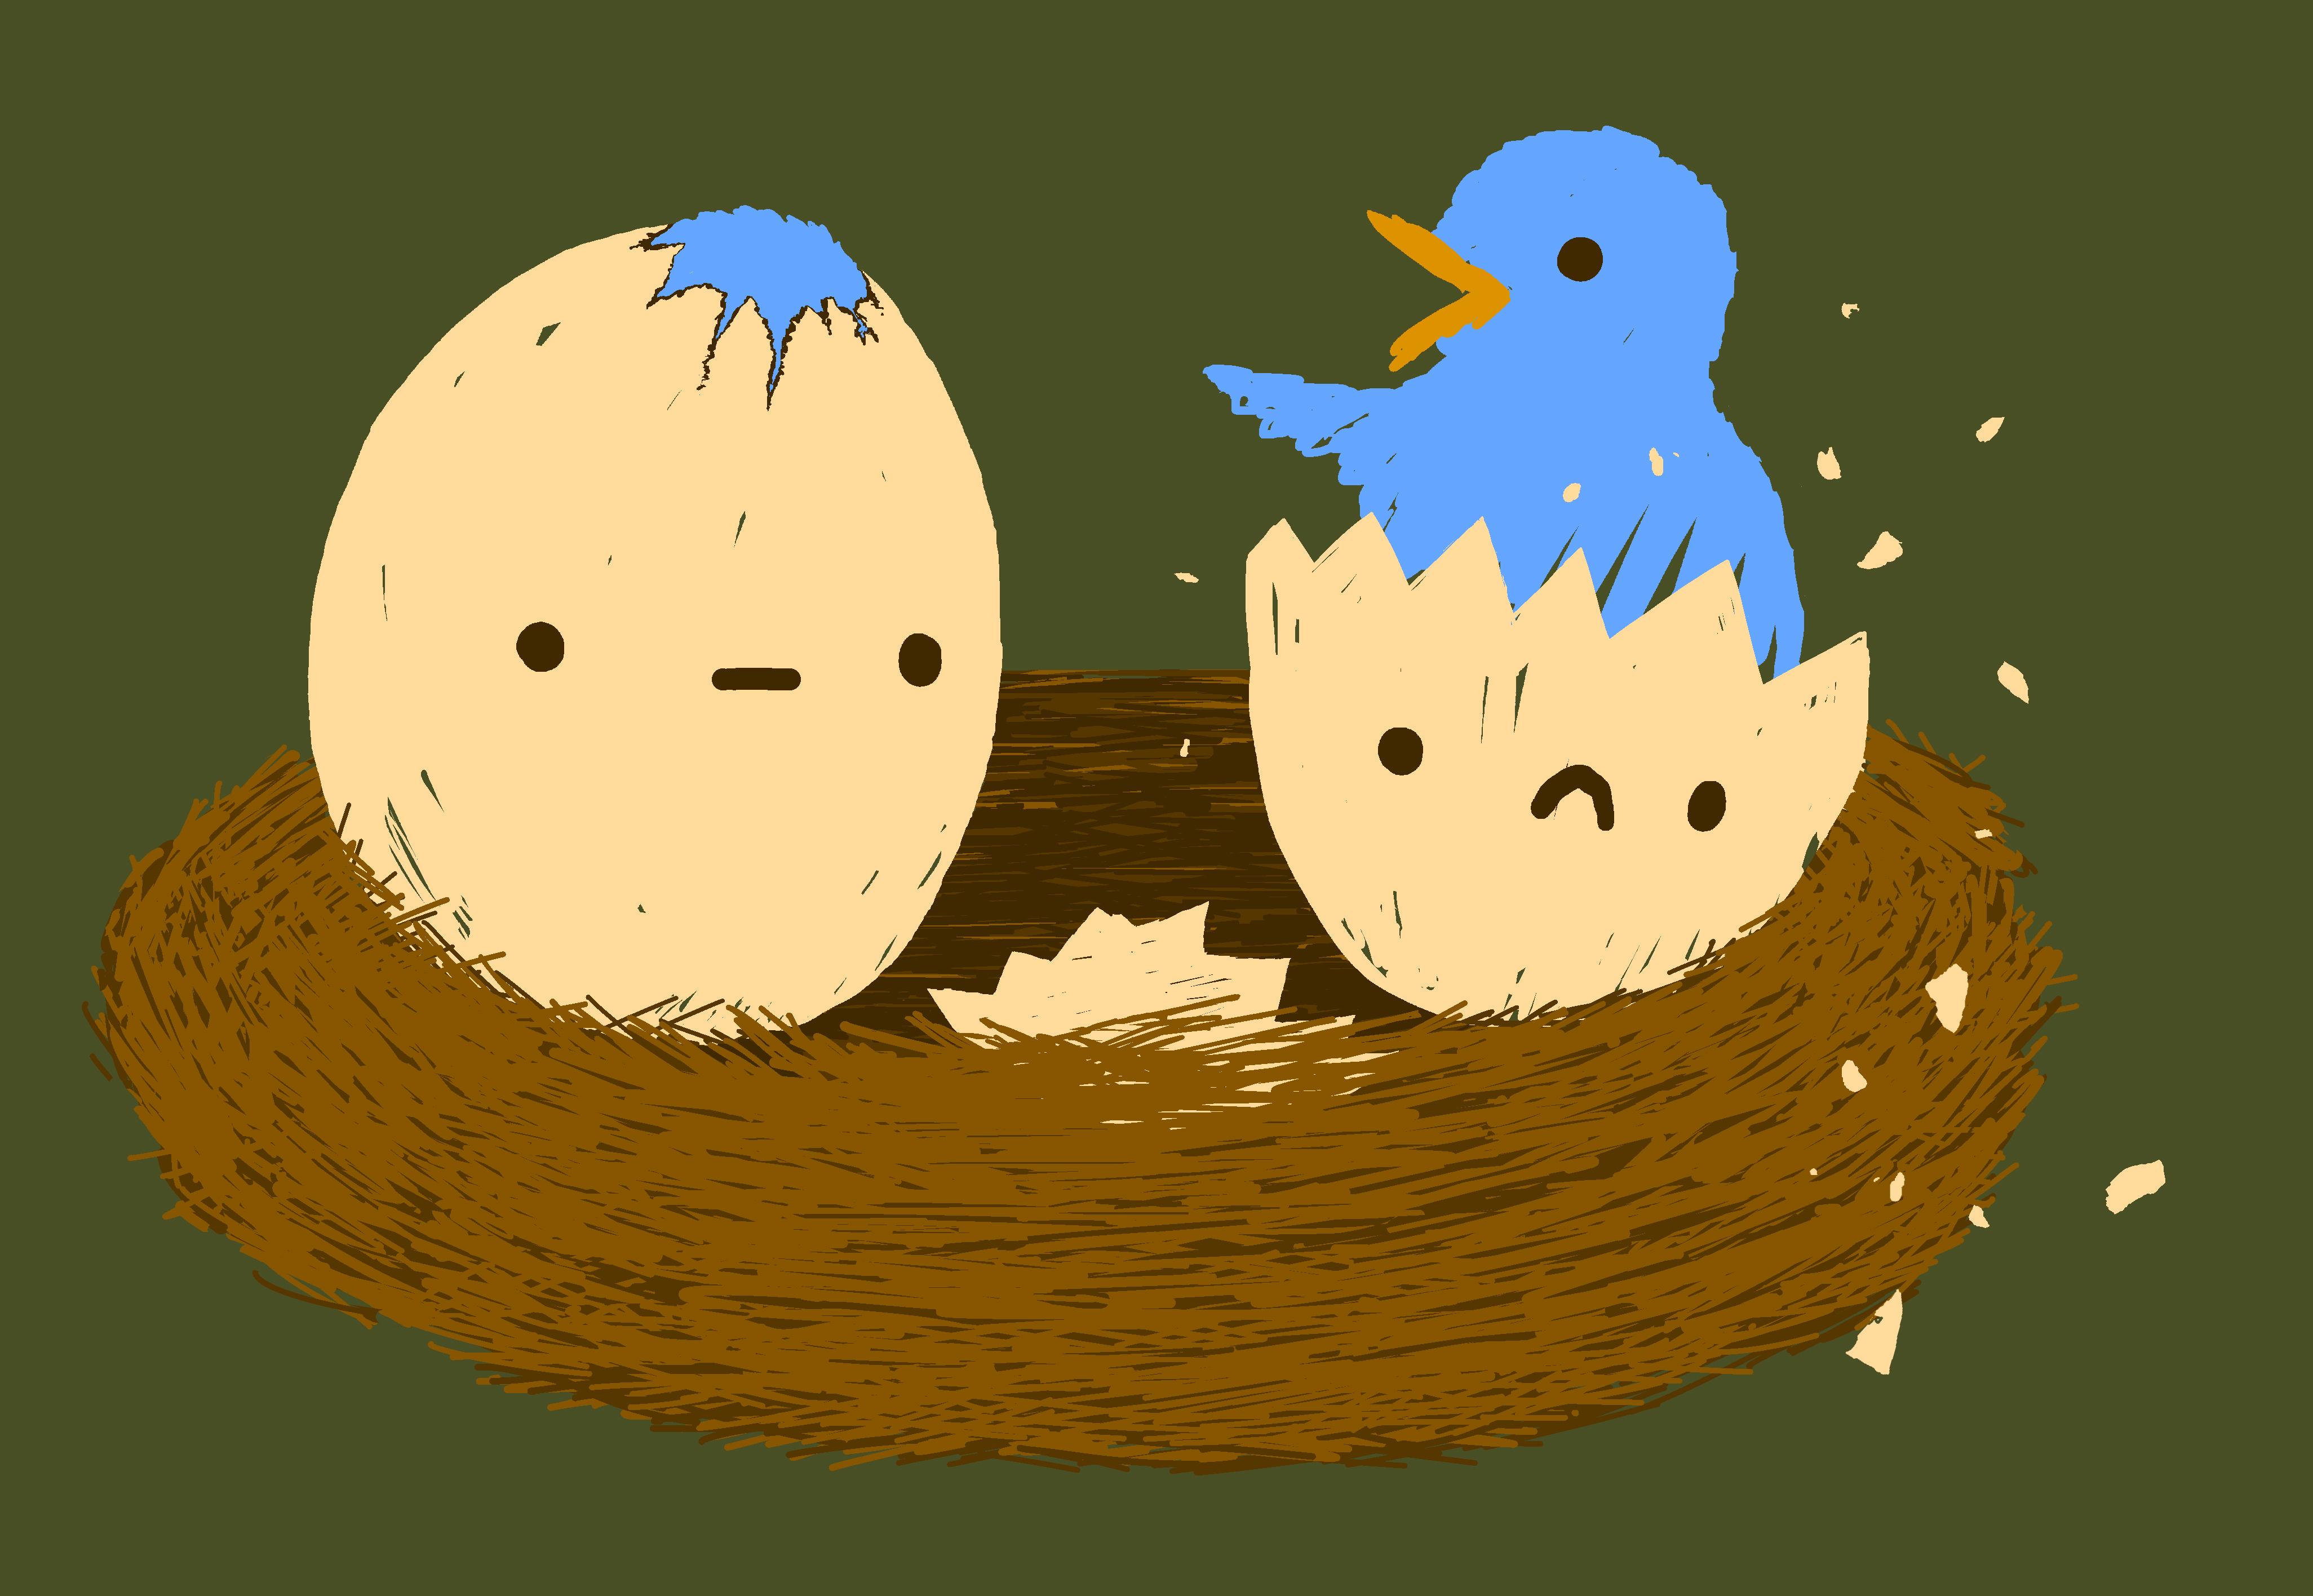 Unfortunate Egg